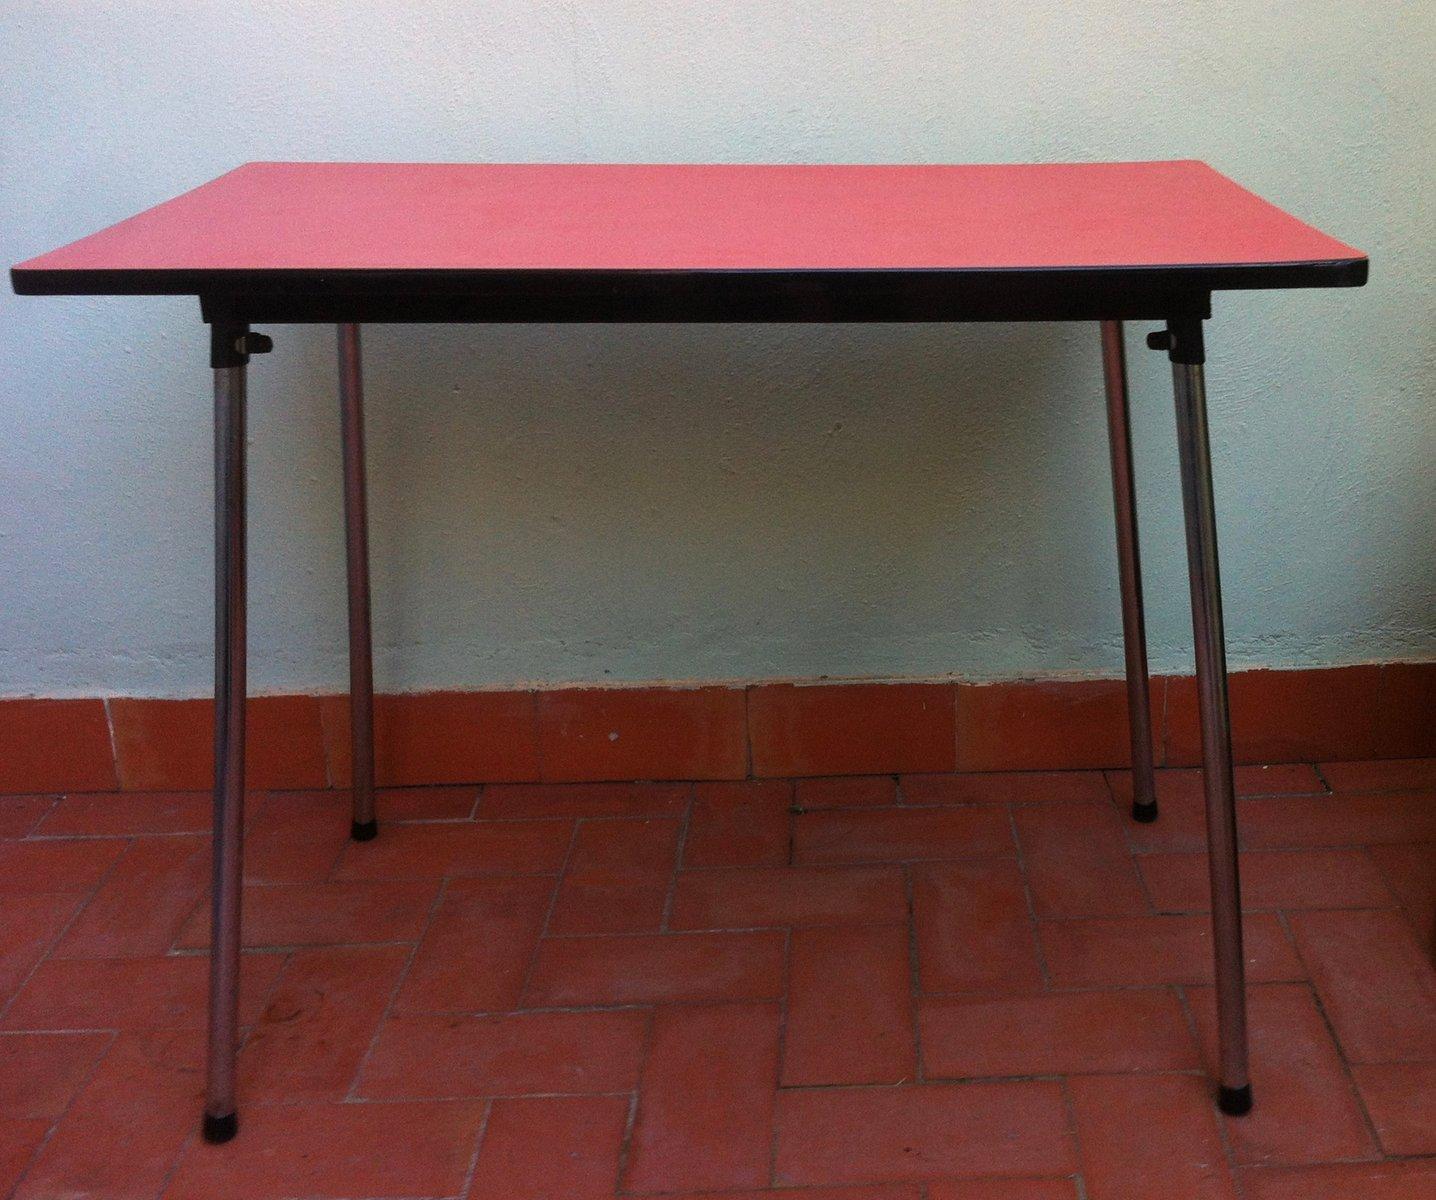 table de salle manger en formica rouge belgique 1960s en vente sur pamono. Black Bedroom Furniture Sets. Home Design Ideas